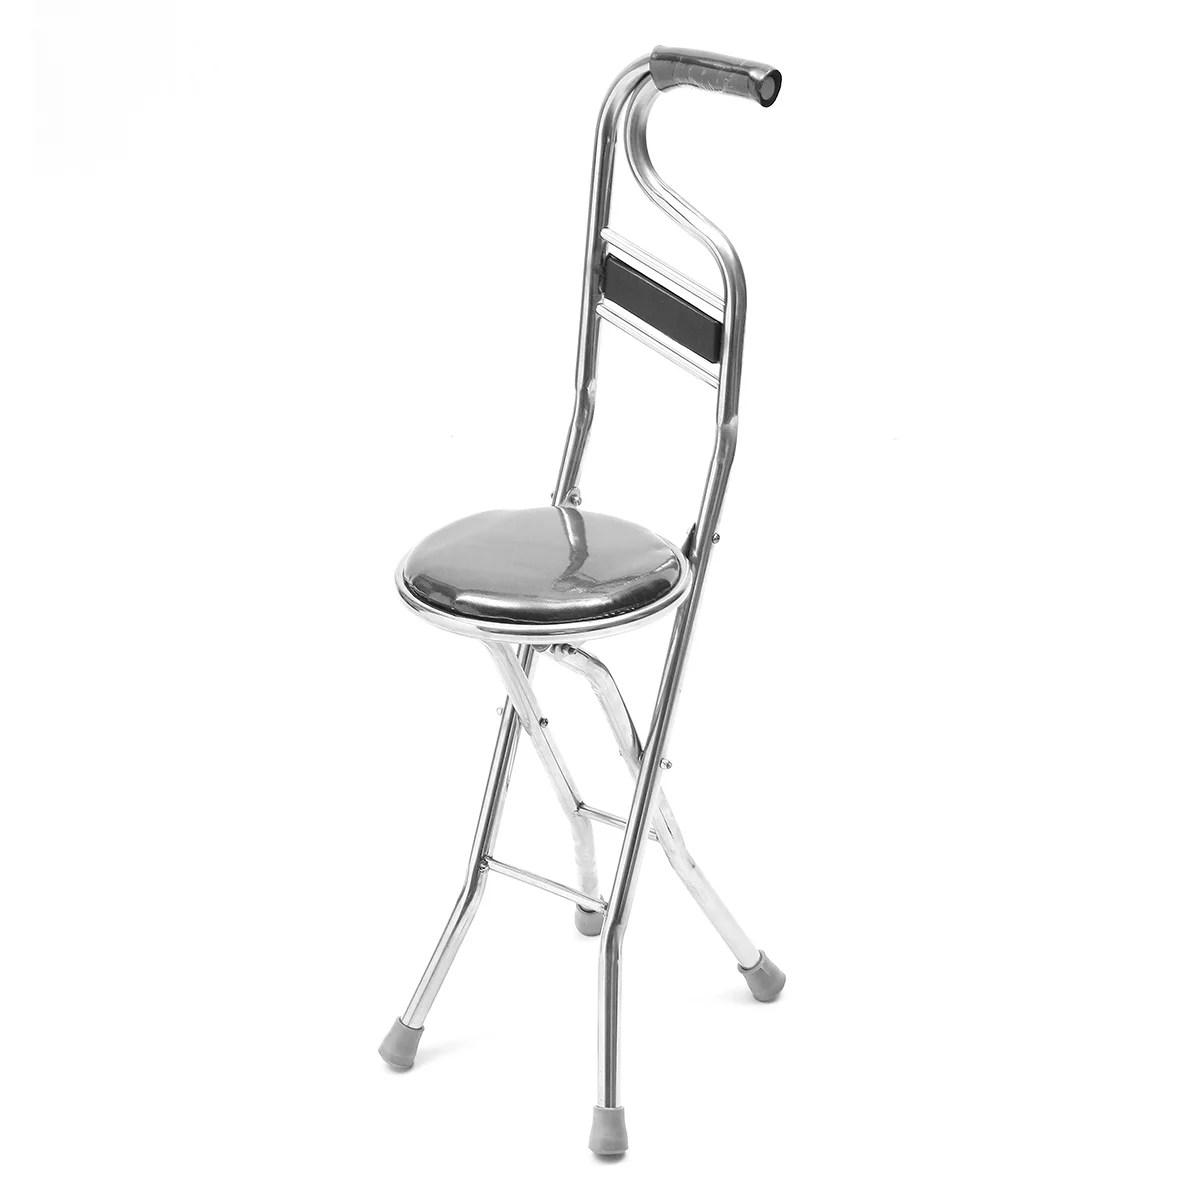 walking stick chair adirondack glider moaere combo folding cane medical lightweight adjustable height stool seat walmart com